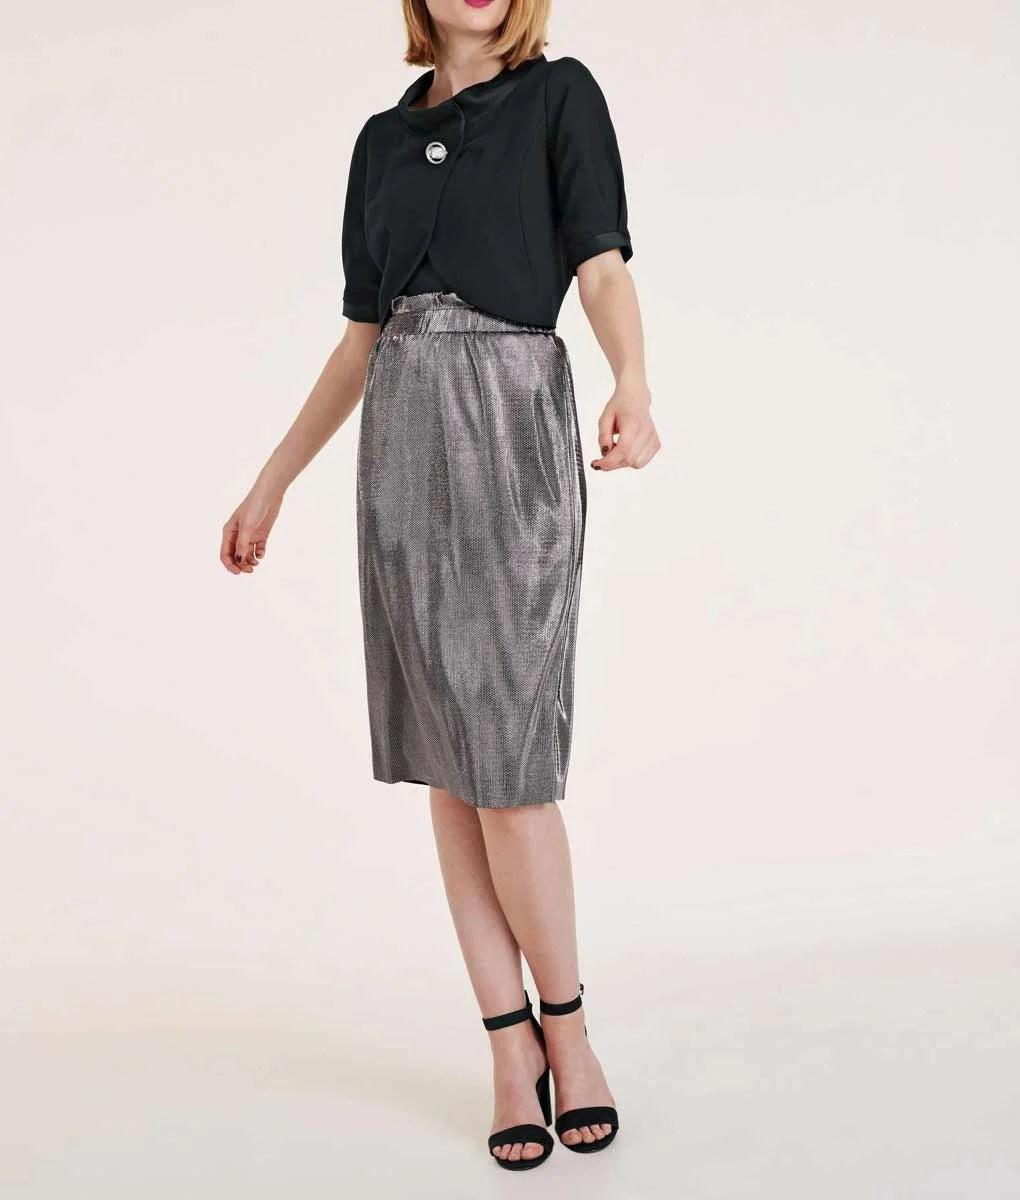 305.761 ASHLEY BROOKE Damen Designer-Rock Silberfarben-Metallic